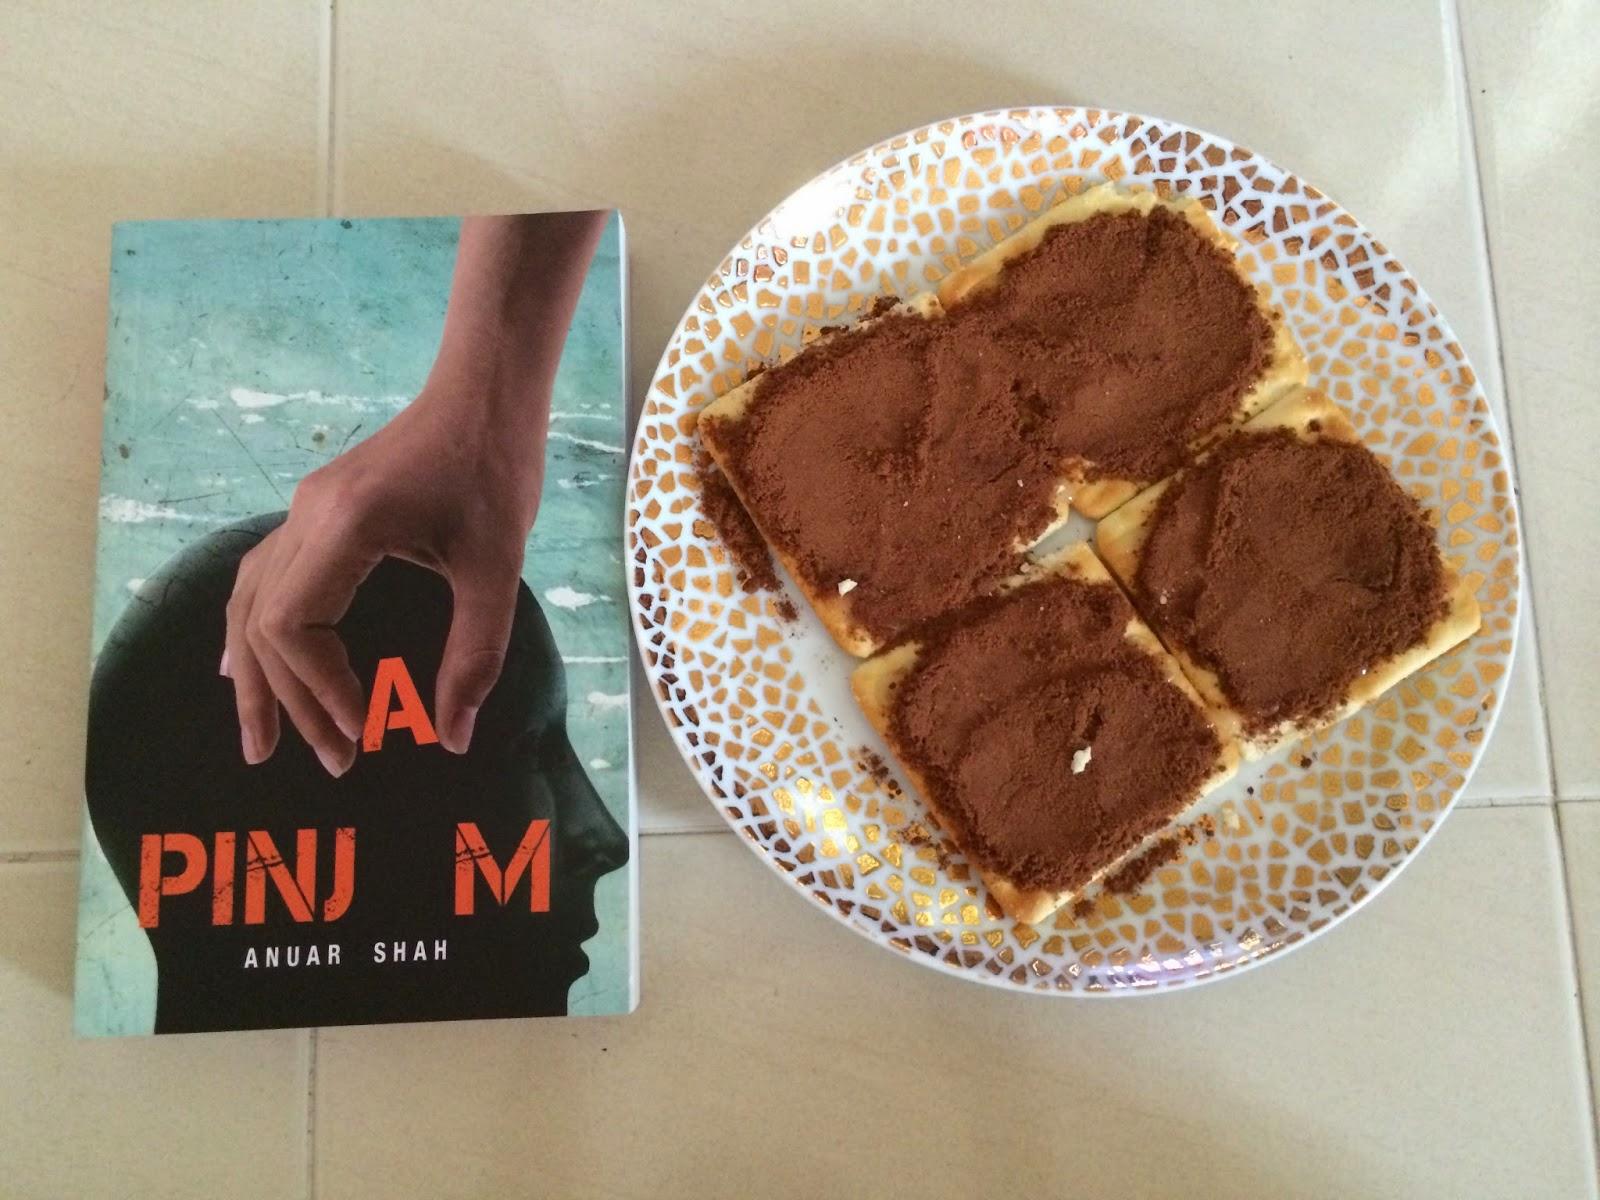 Review novel Pinjam